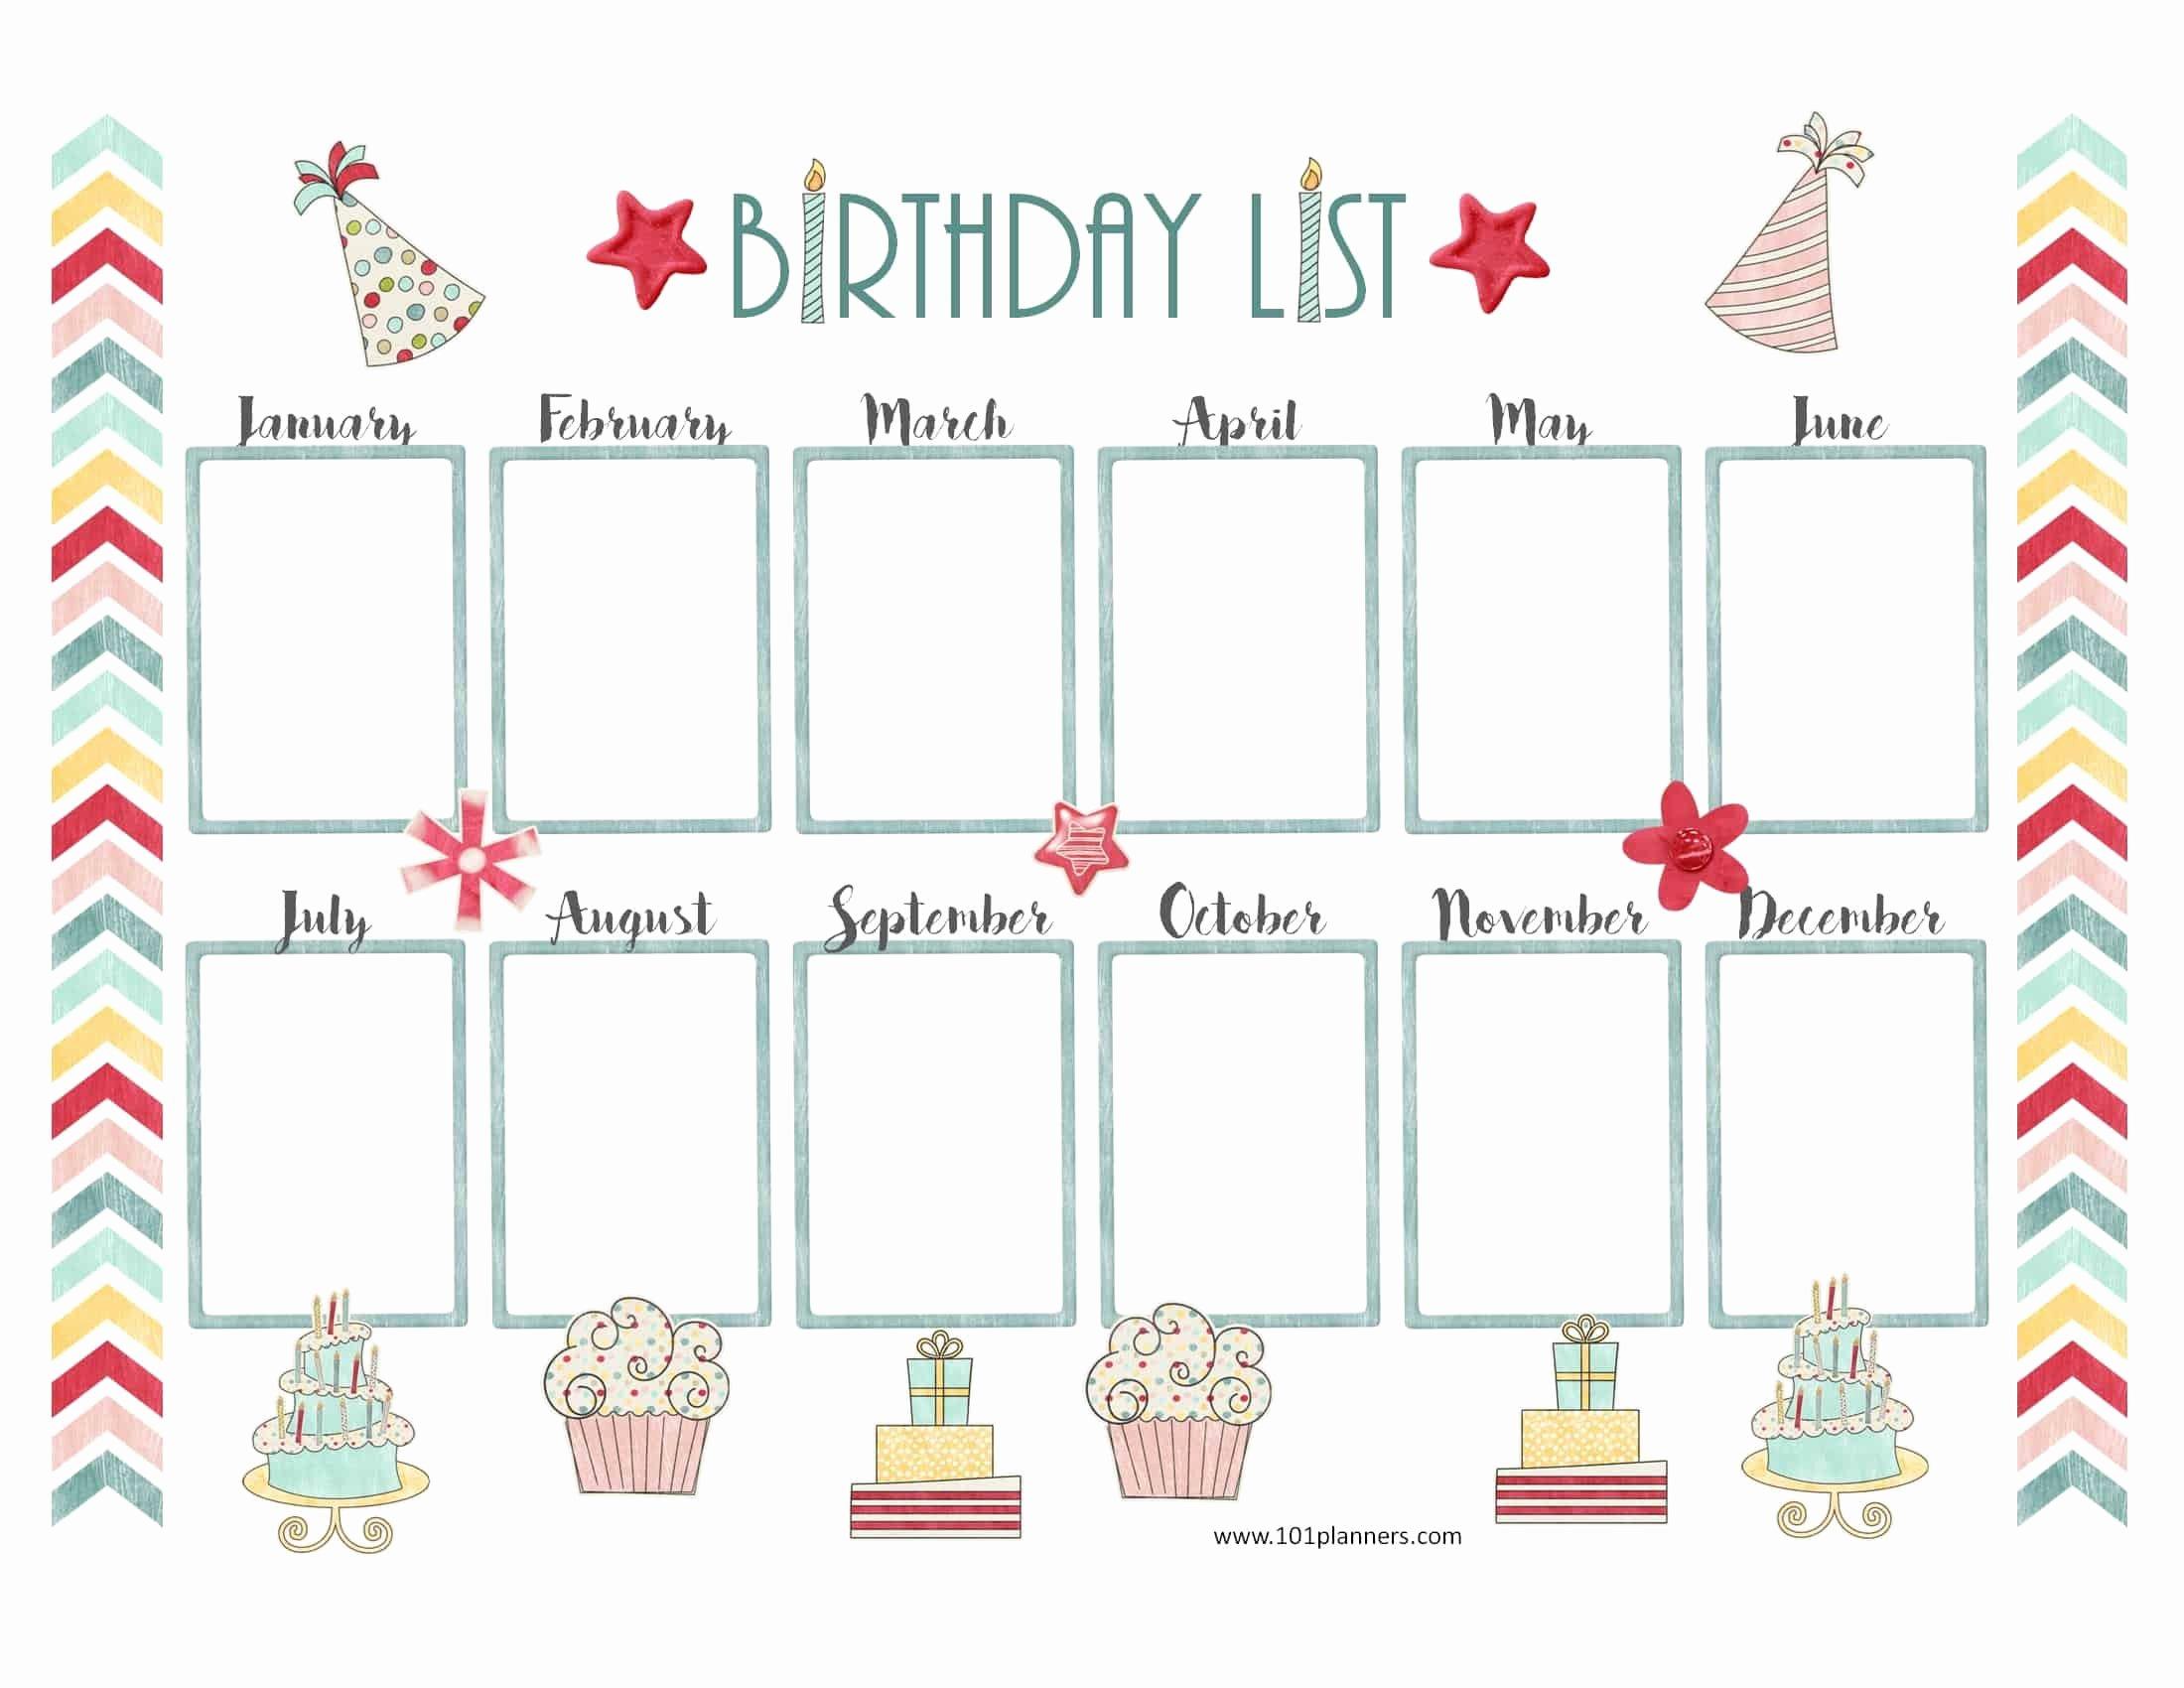 Employee Birthday List Template Luxury Free Birthday Calendar